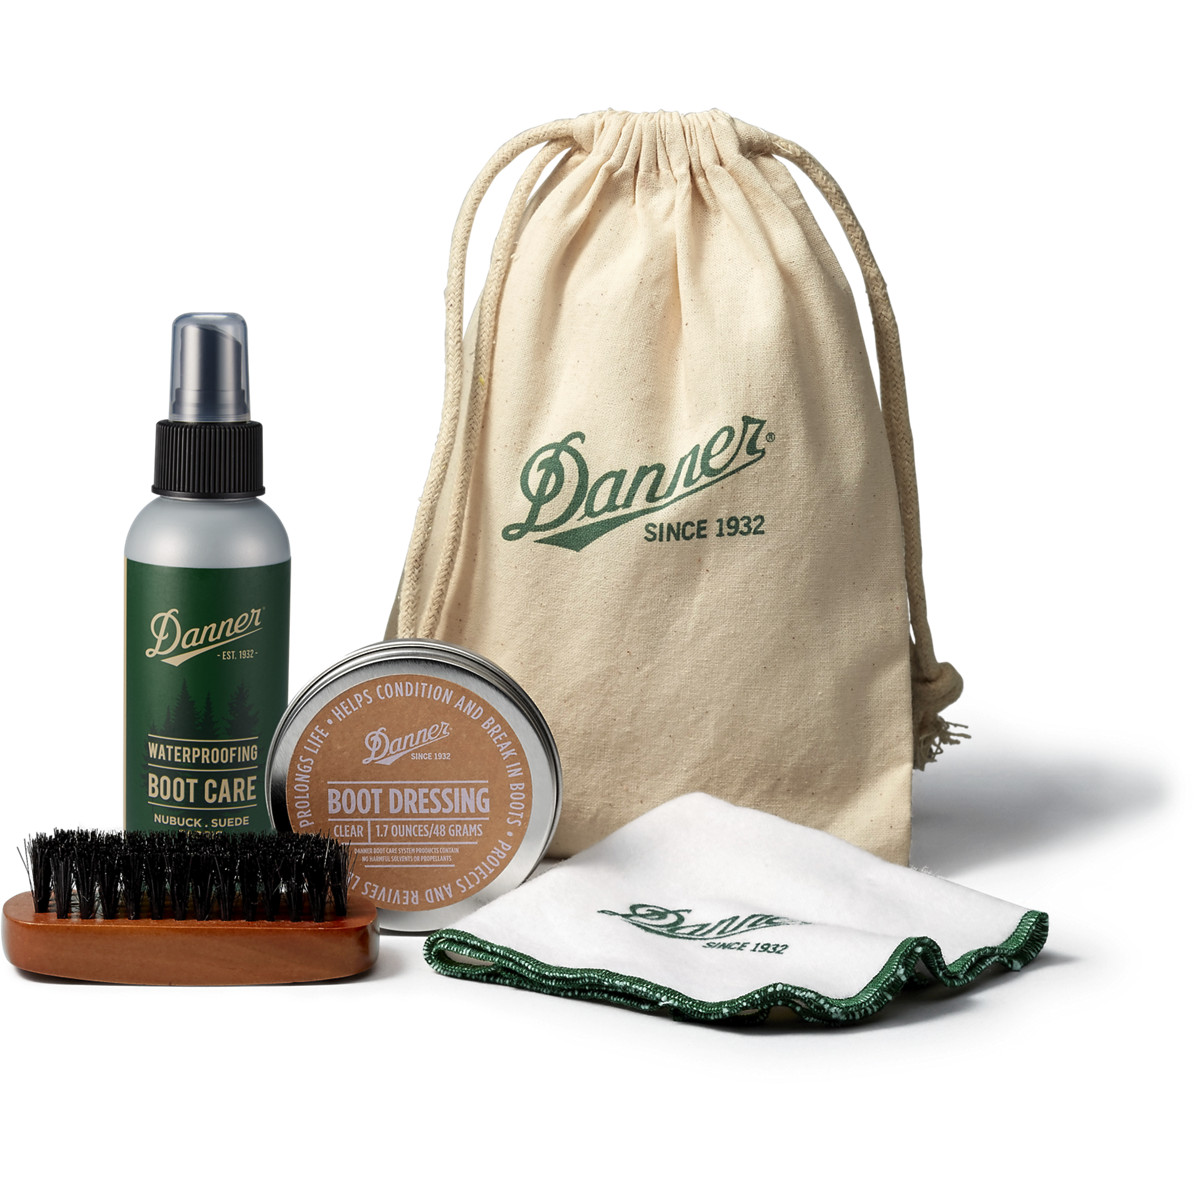 Danner Boot Care Kit – Essential